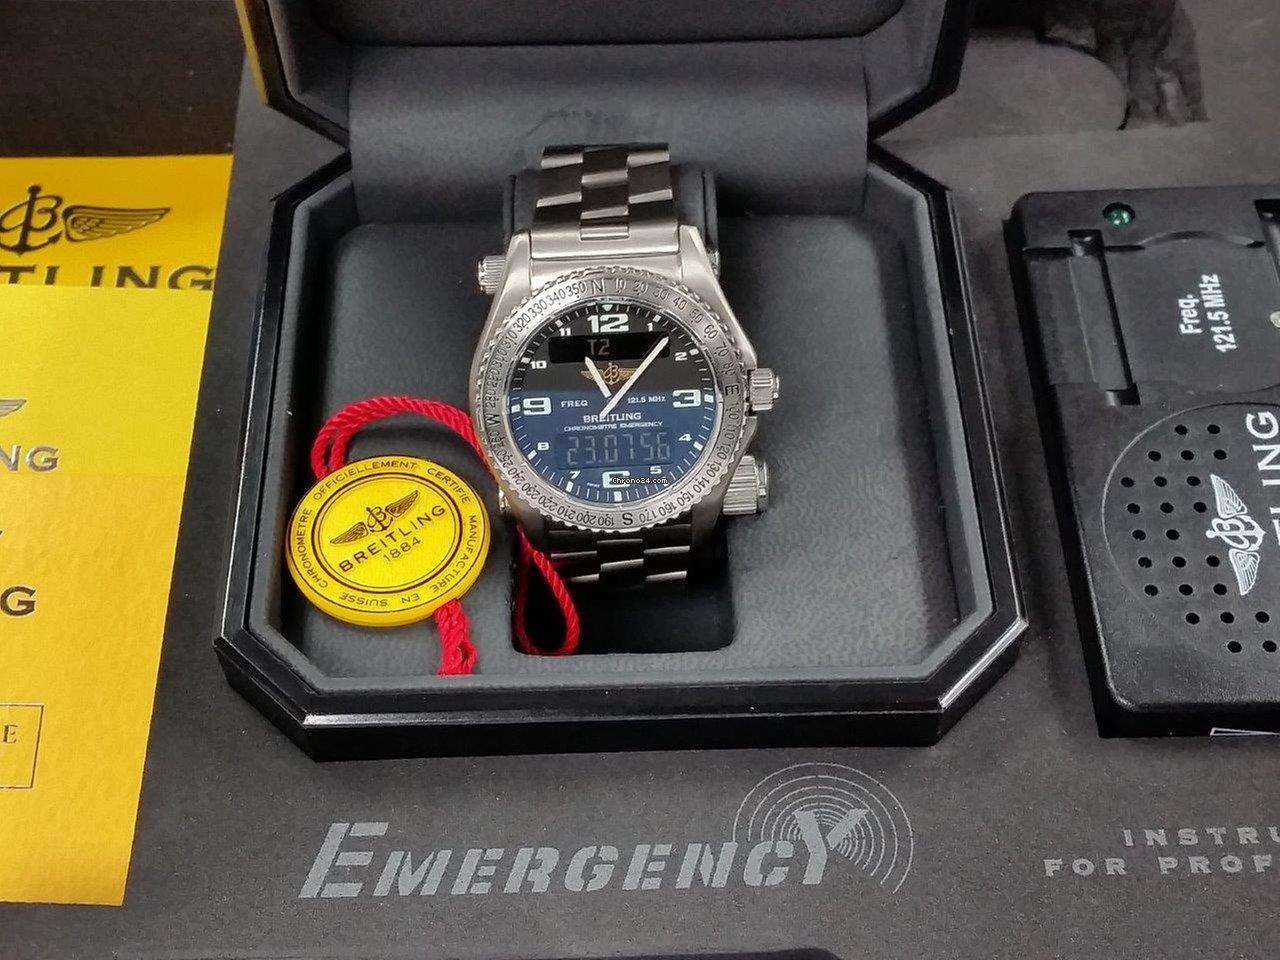 Breitling EMERGENCY Rescue Super-Watch Titanium Full Set Serv-Records